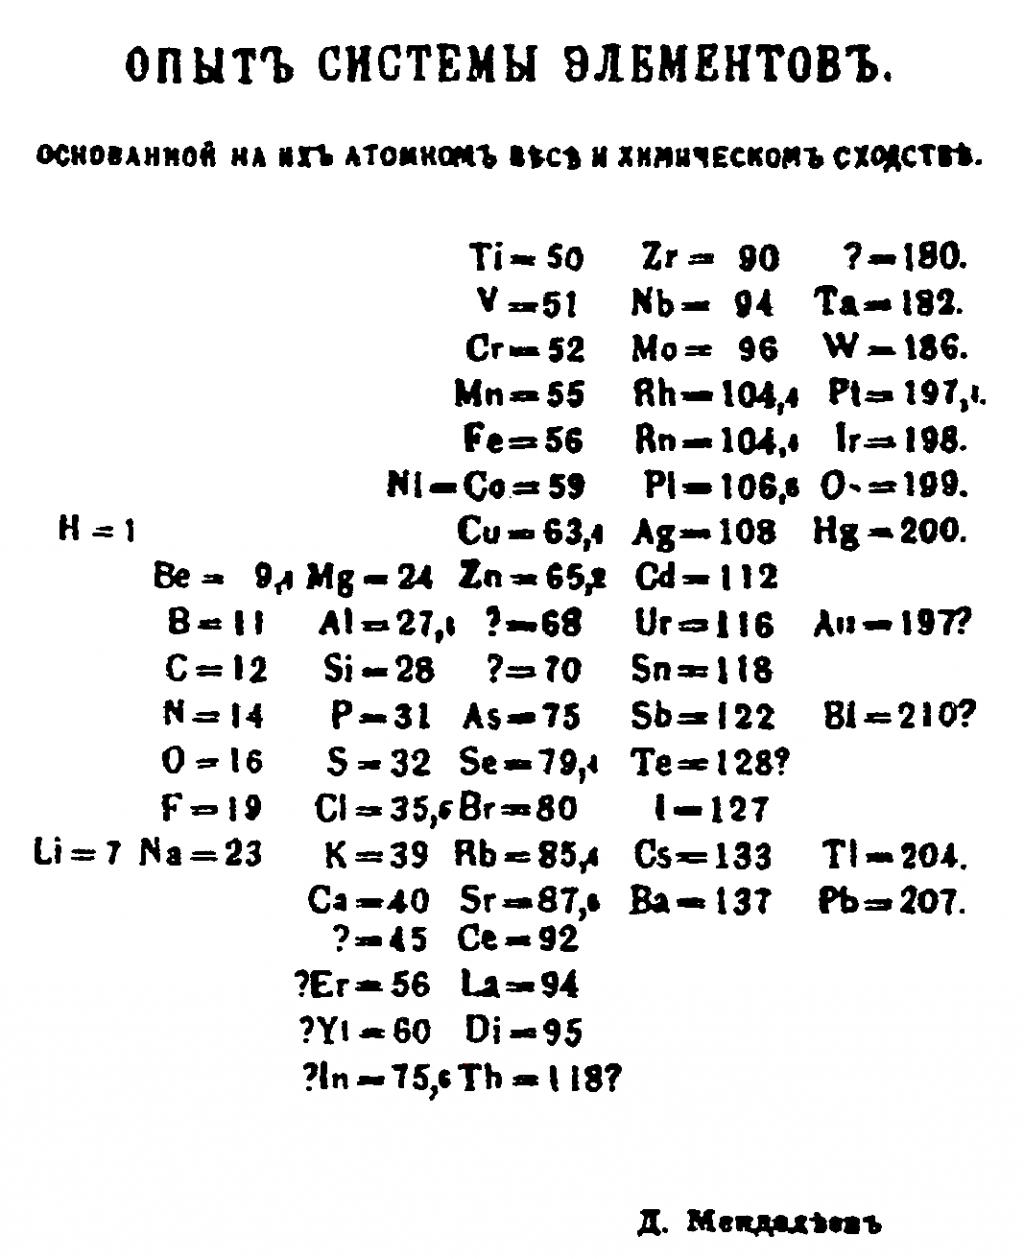 Chemestry notes development of periodic table organization of filedesc author mendeleyev 1869 gamestrikefo Images